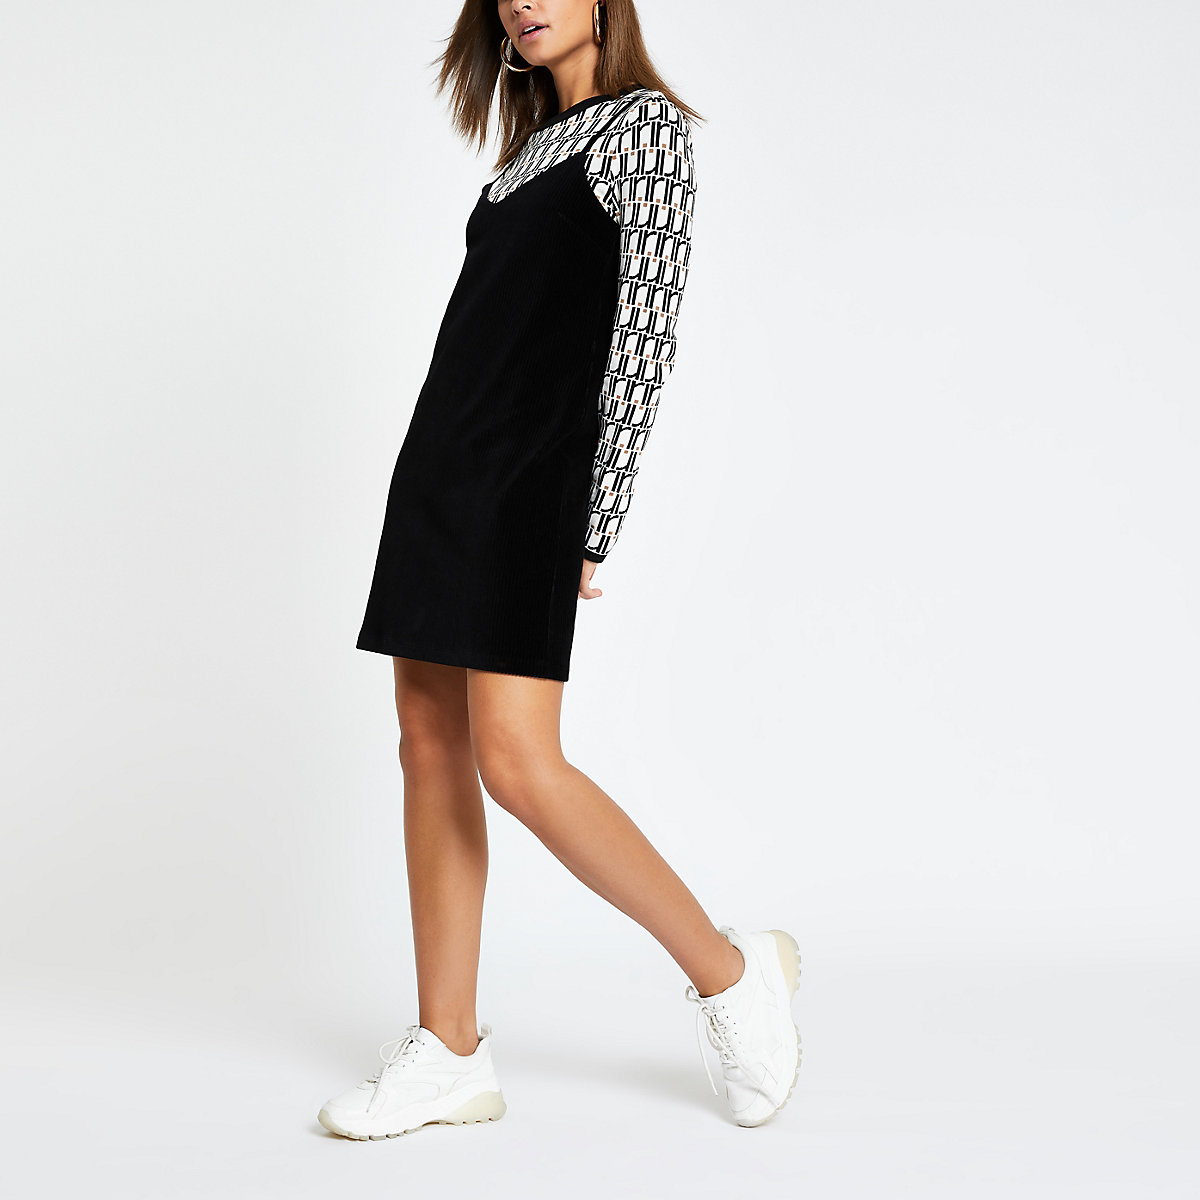 Black cord slip dress